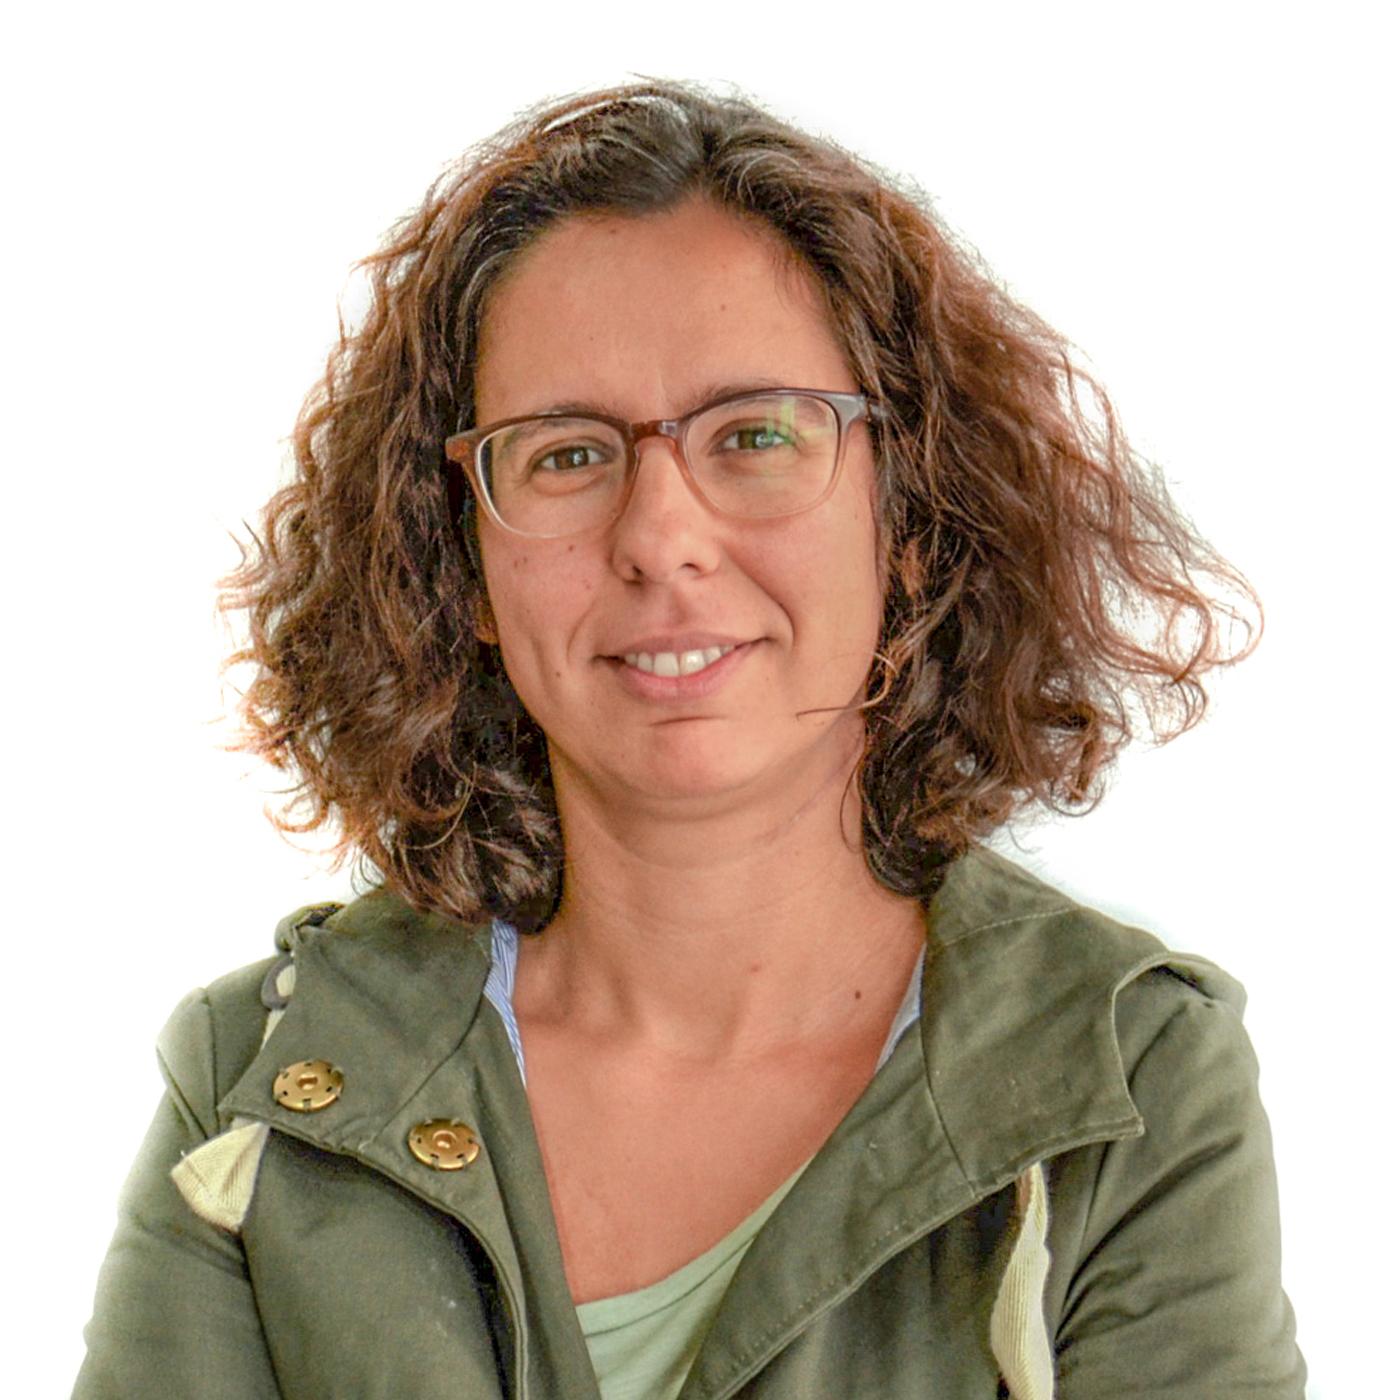 Rita Cardoso